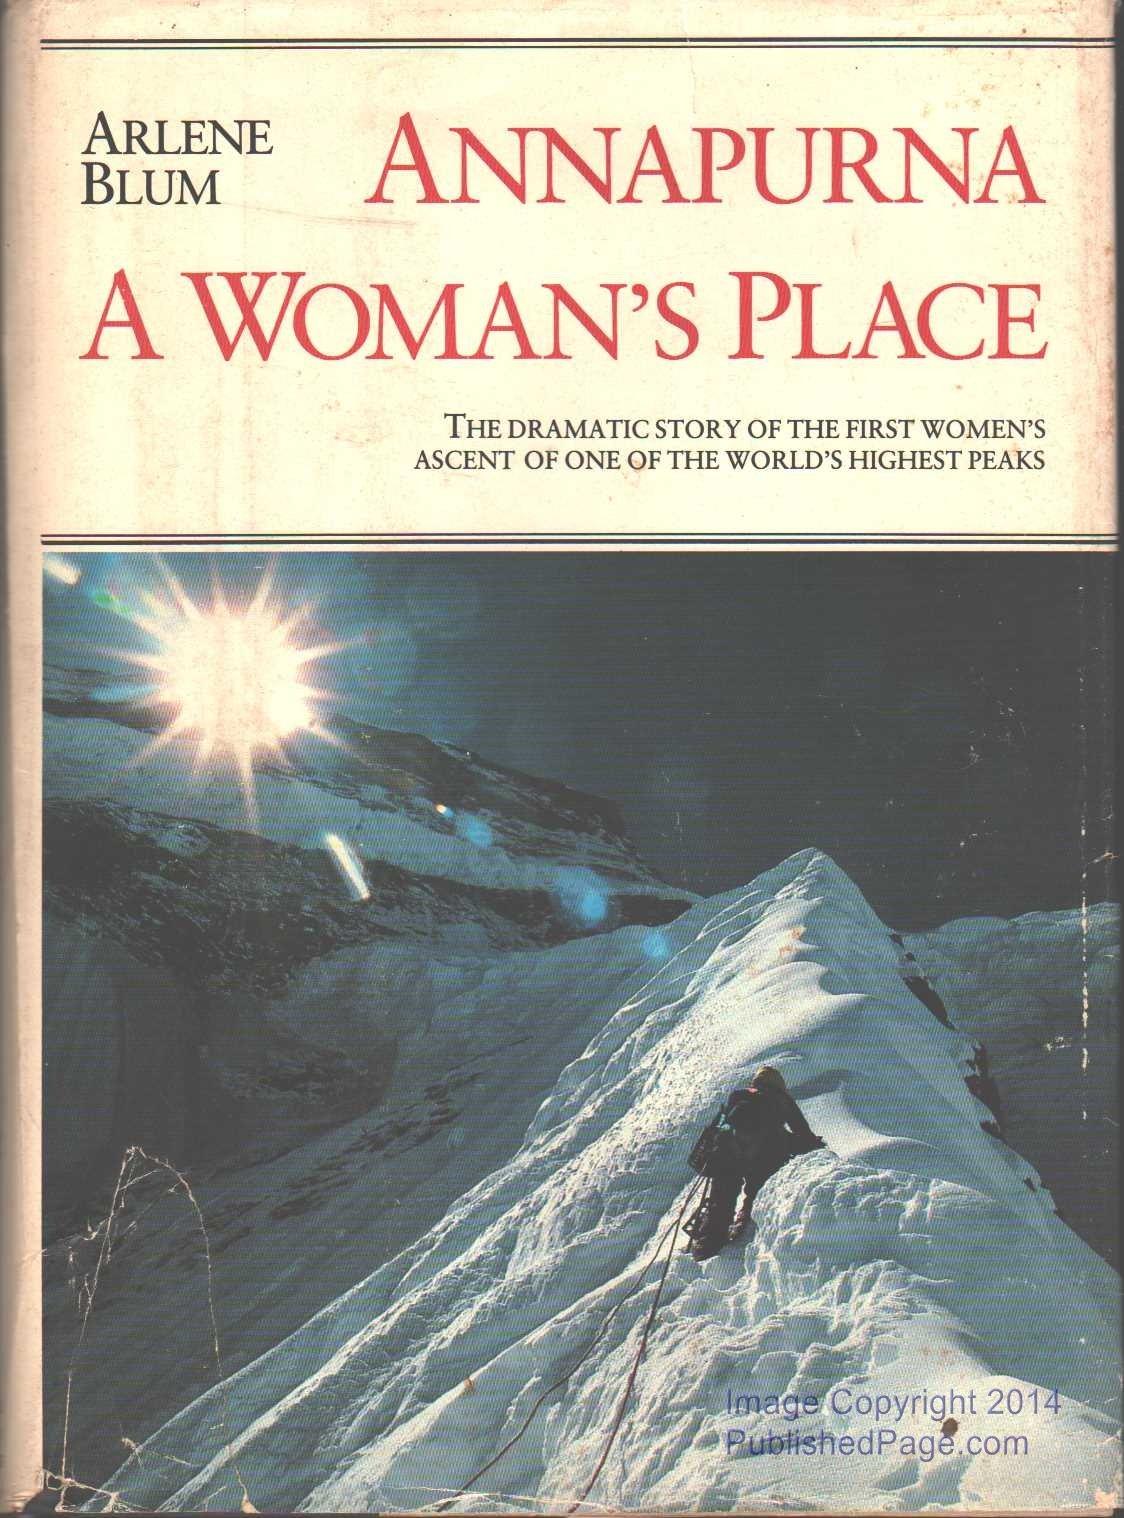 Annapurna: A Woman's Place, Blum, Arlene